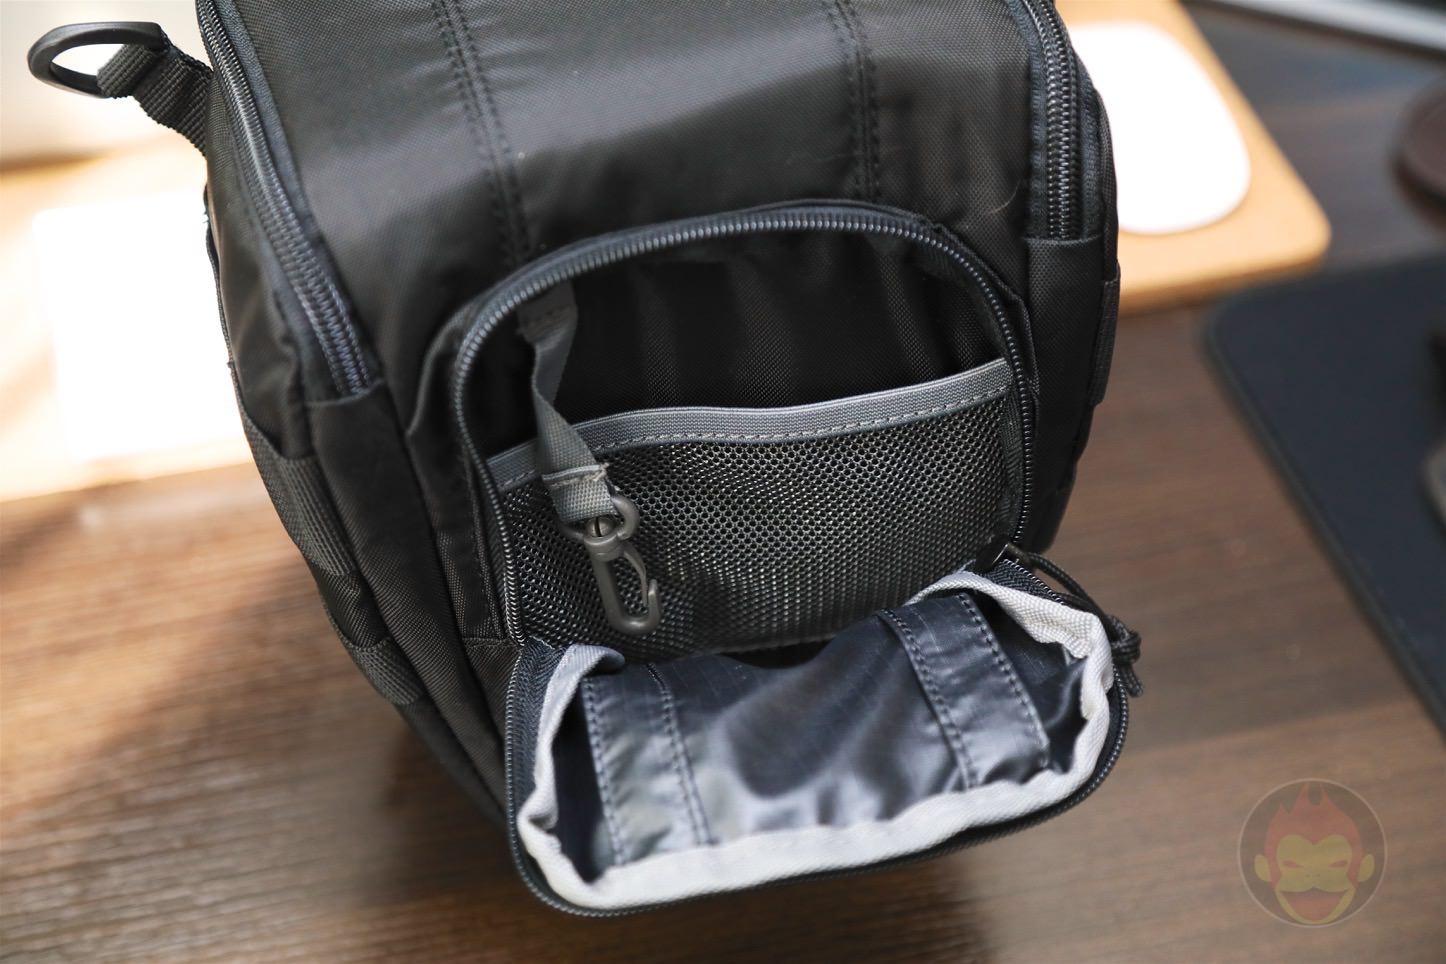 Lowepro-Camera-bag-Toploader-Zoom-AW2-02.jpg